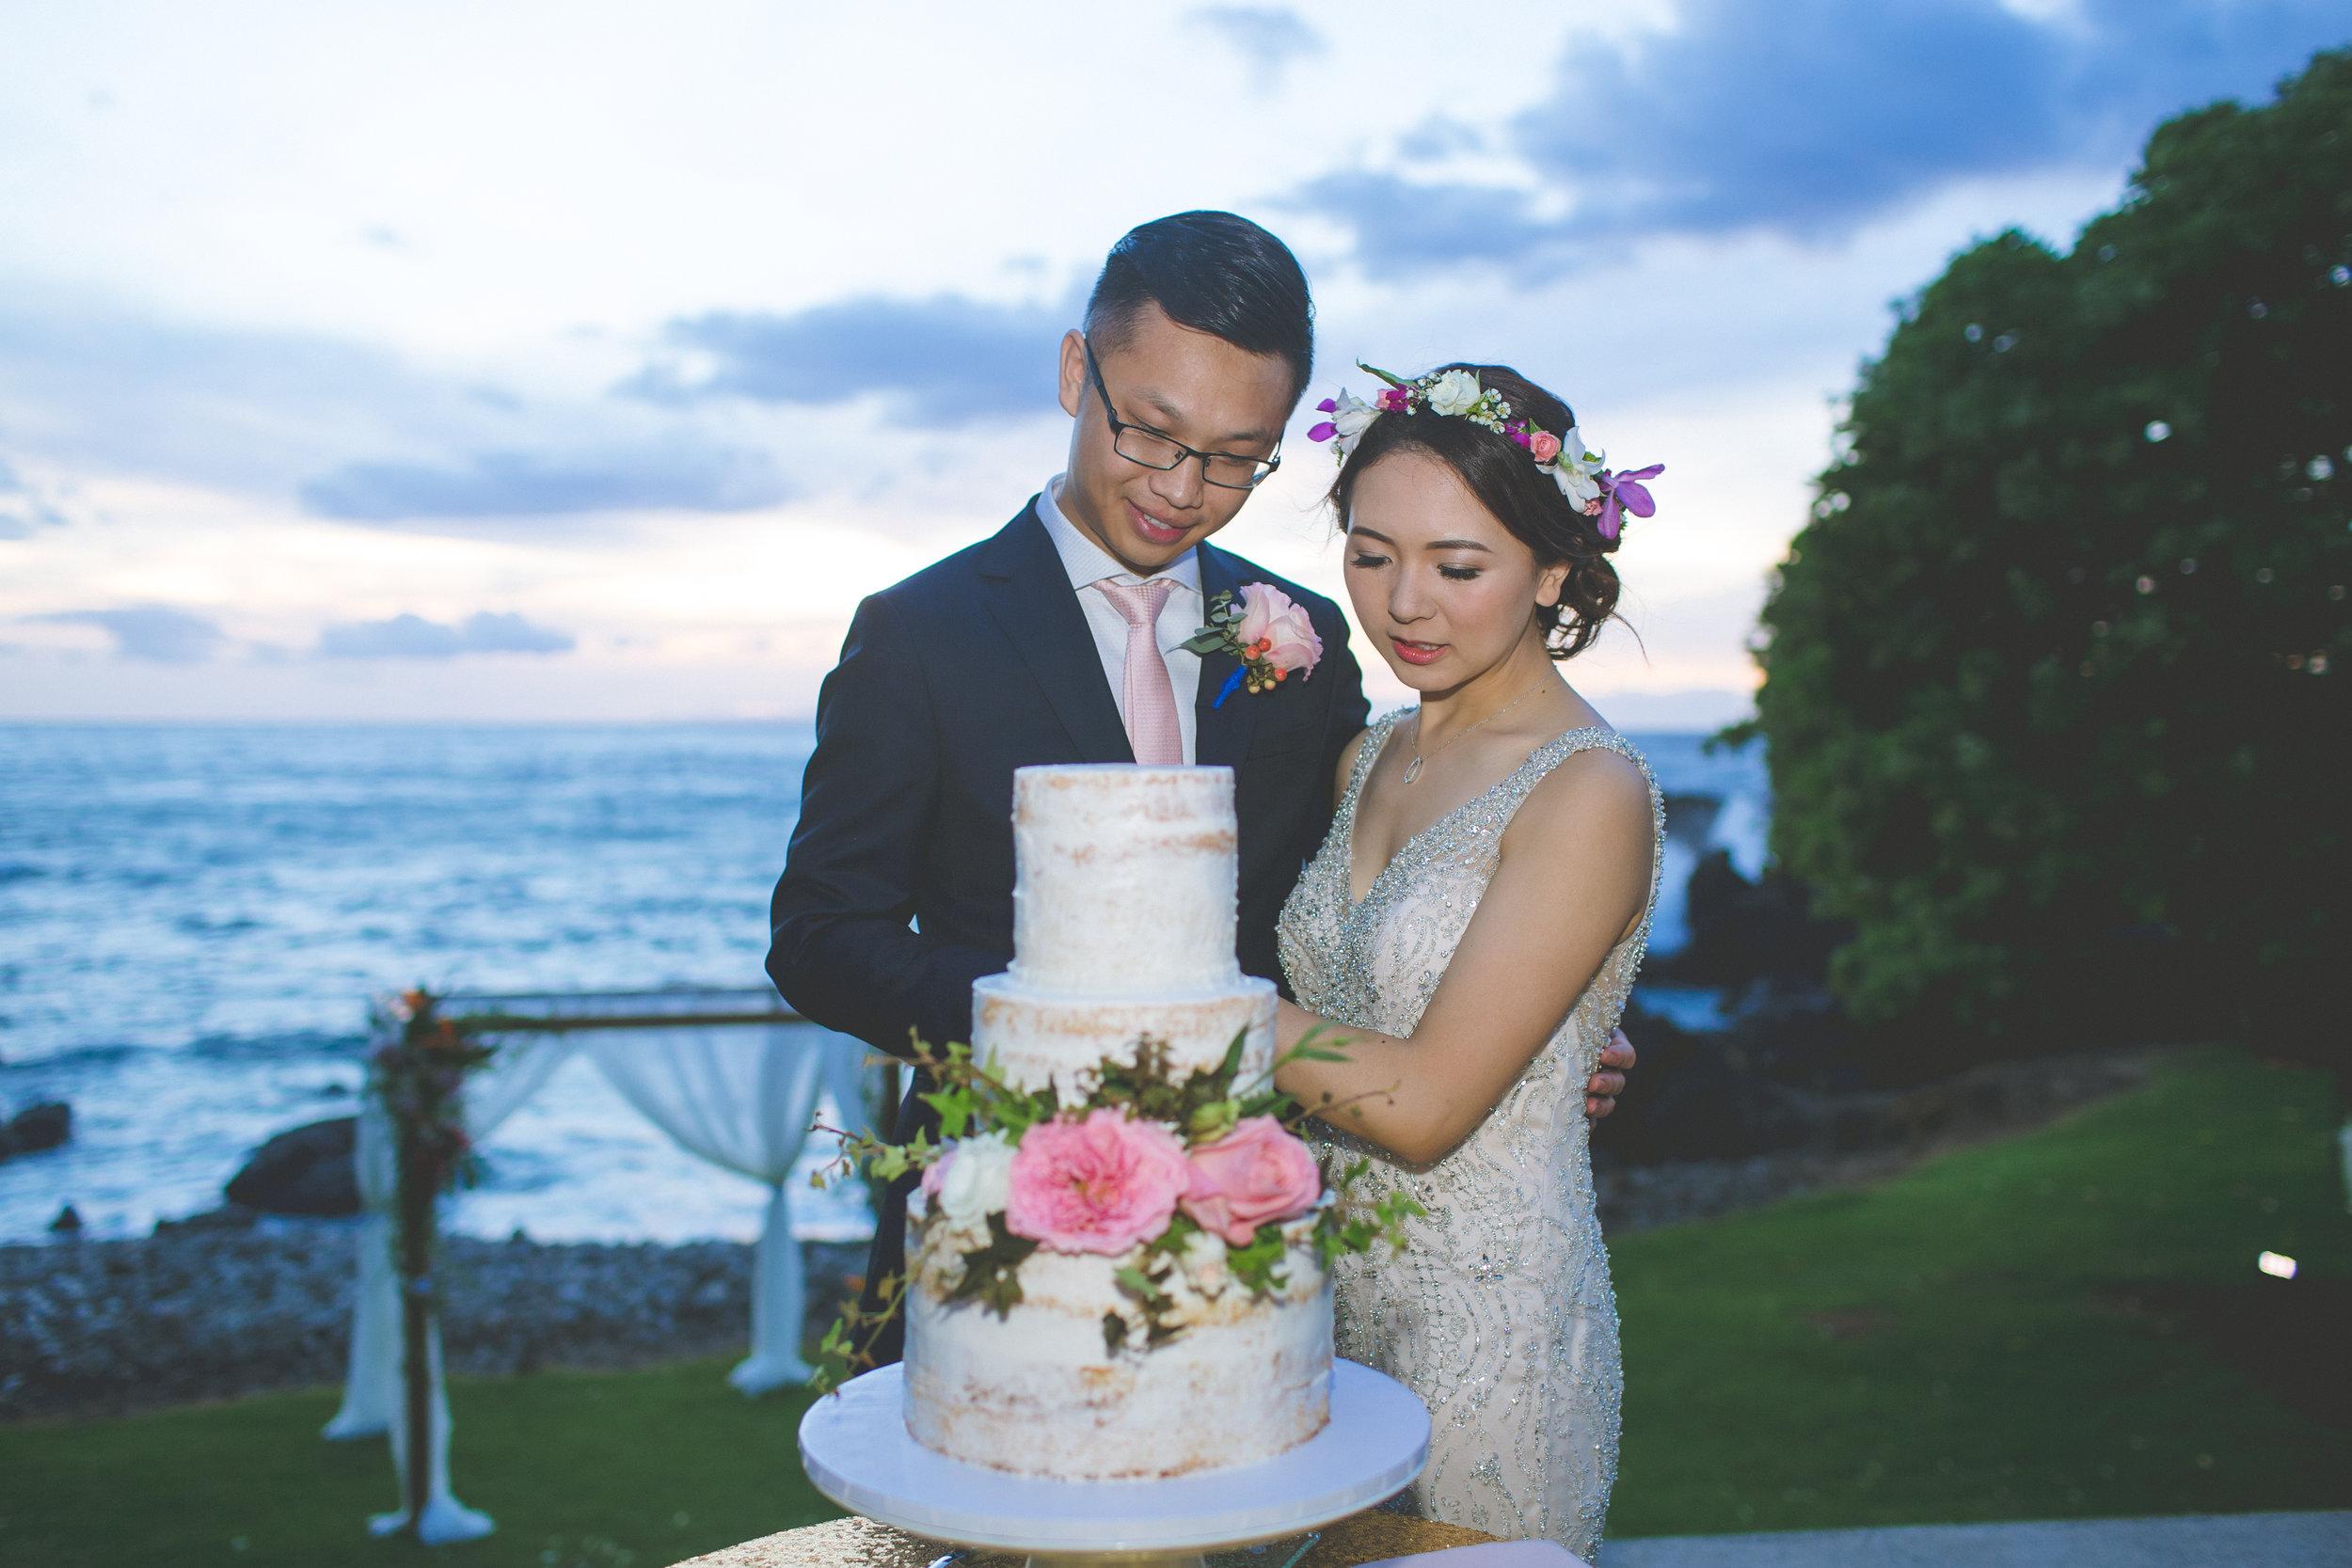 Wedding Cake - Dmitri and Sandra Photography